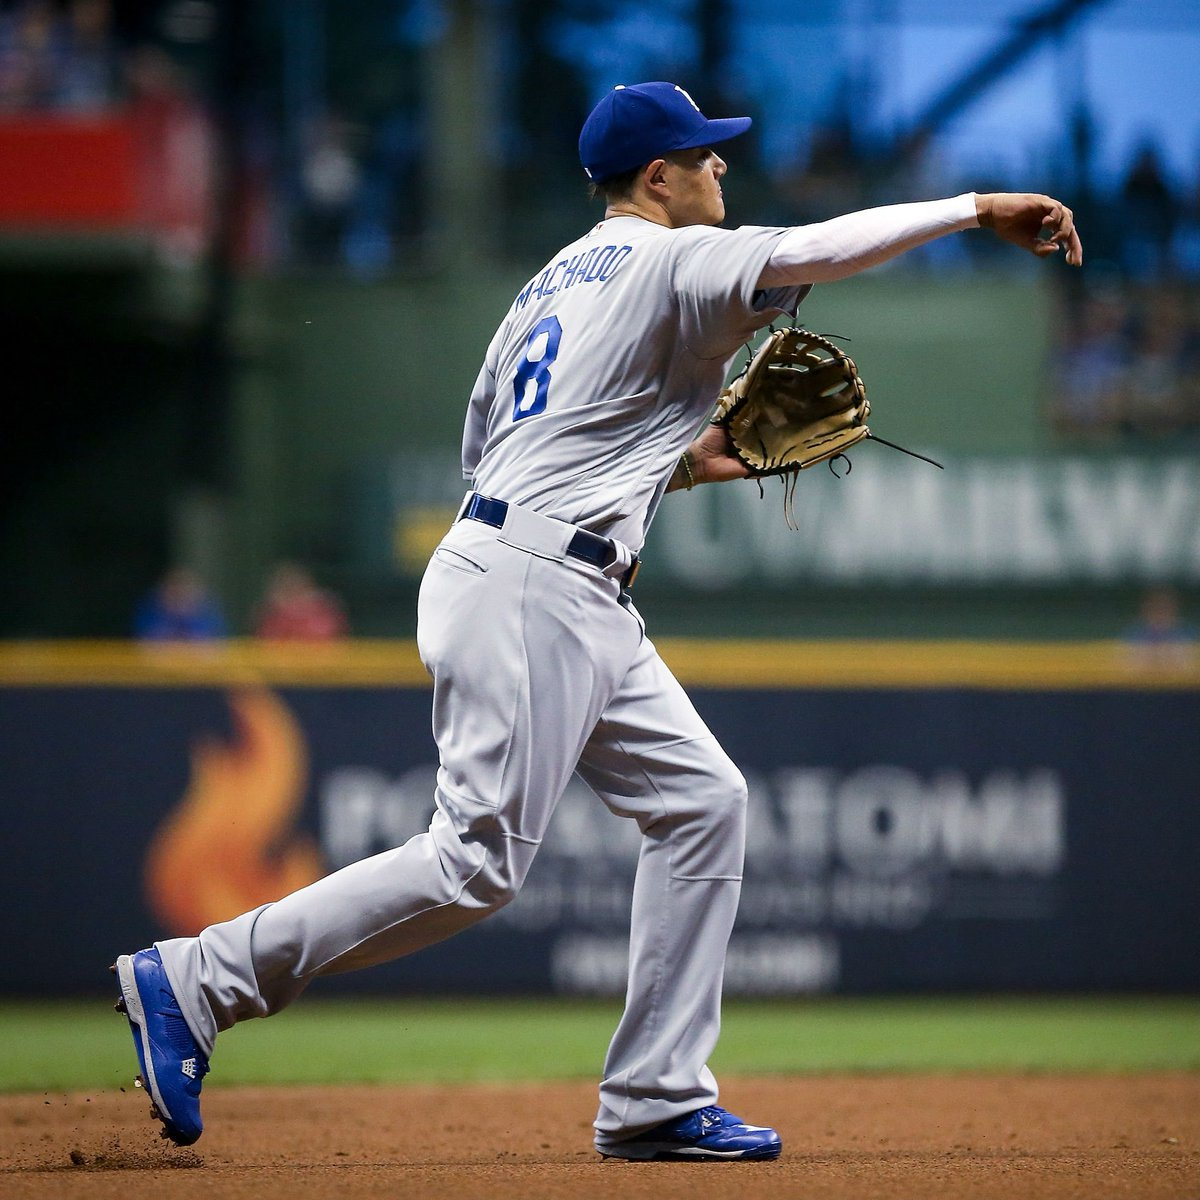 #SoleWatch: New Dodgers shortstop Manny Machado wearing blue Air Jordan 4 cleats.